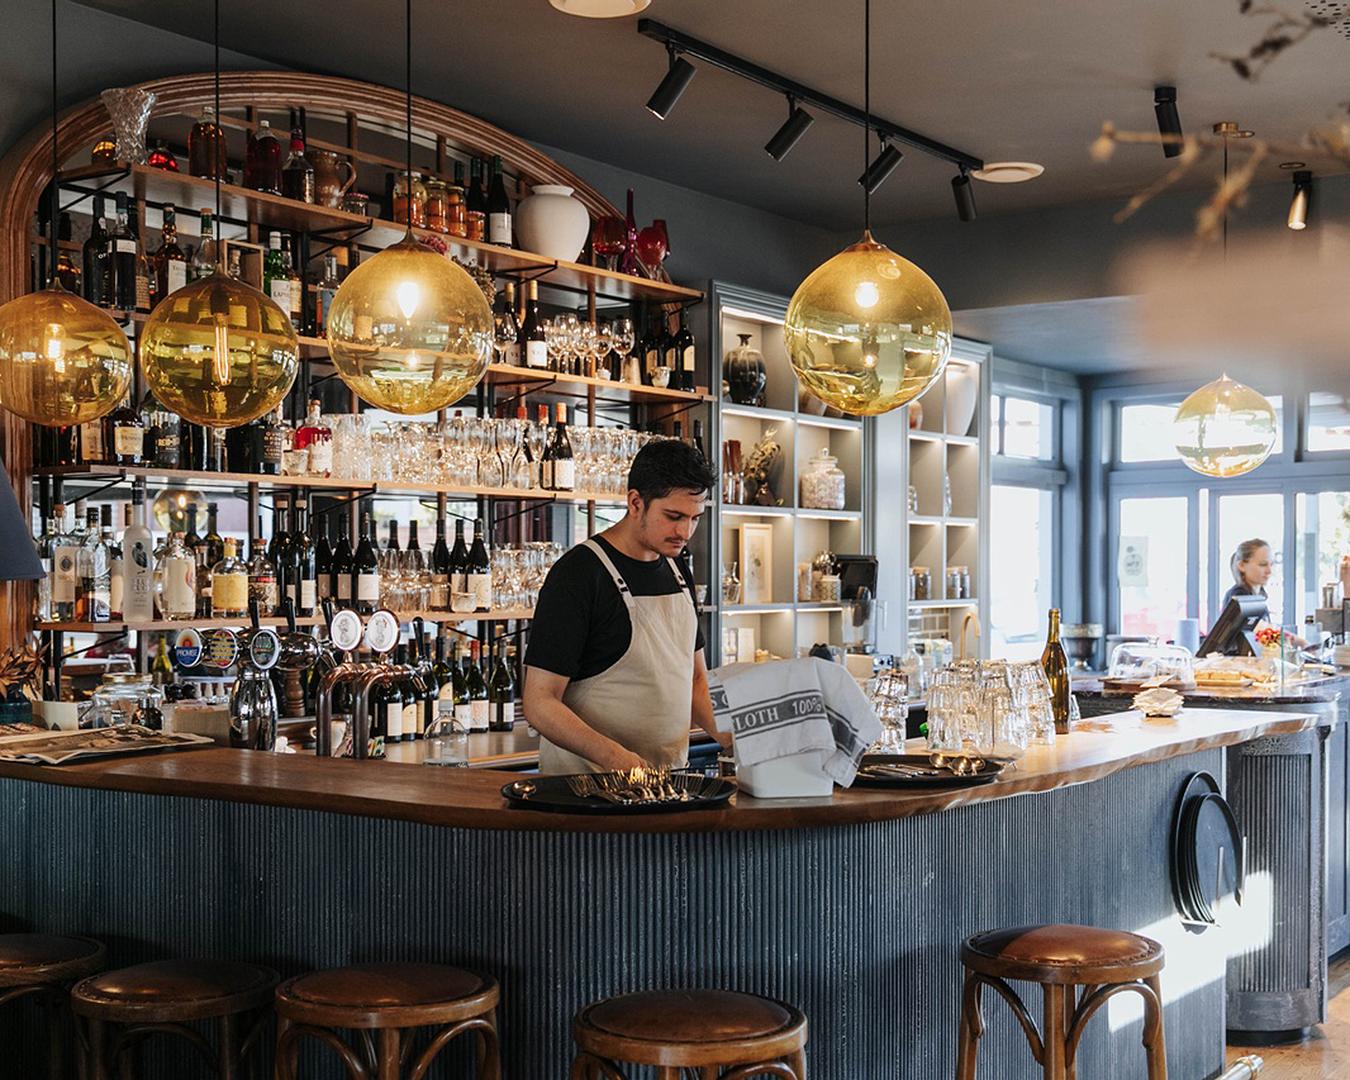 The lovely wooden bar at No.7 Balmac.